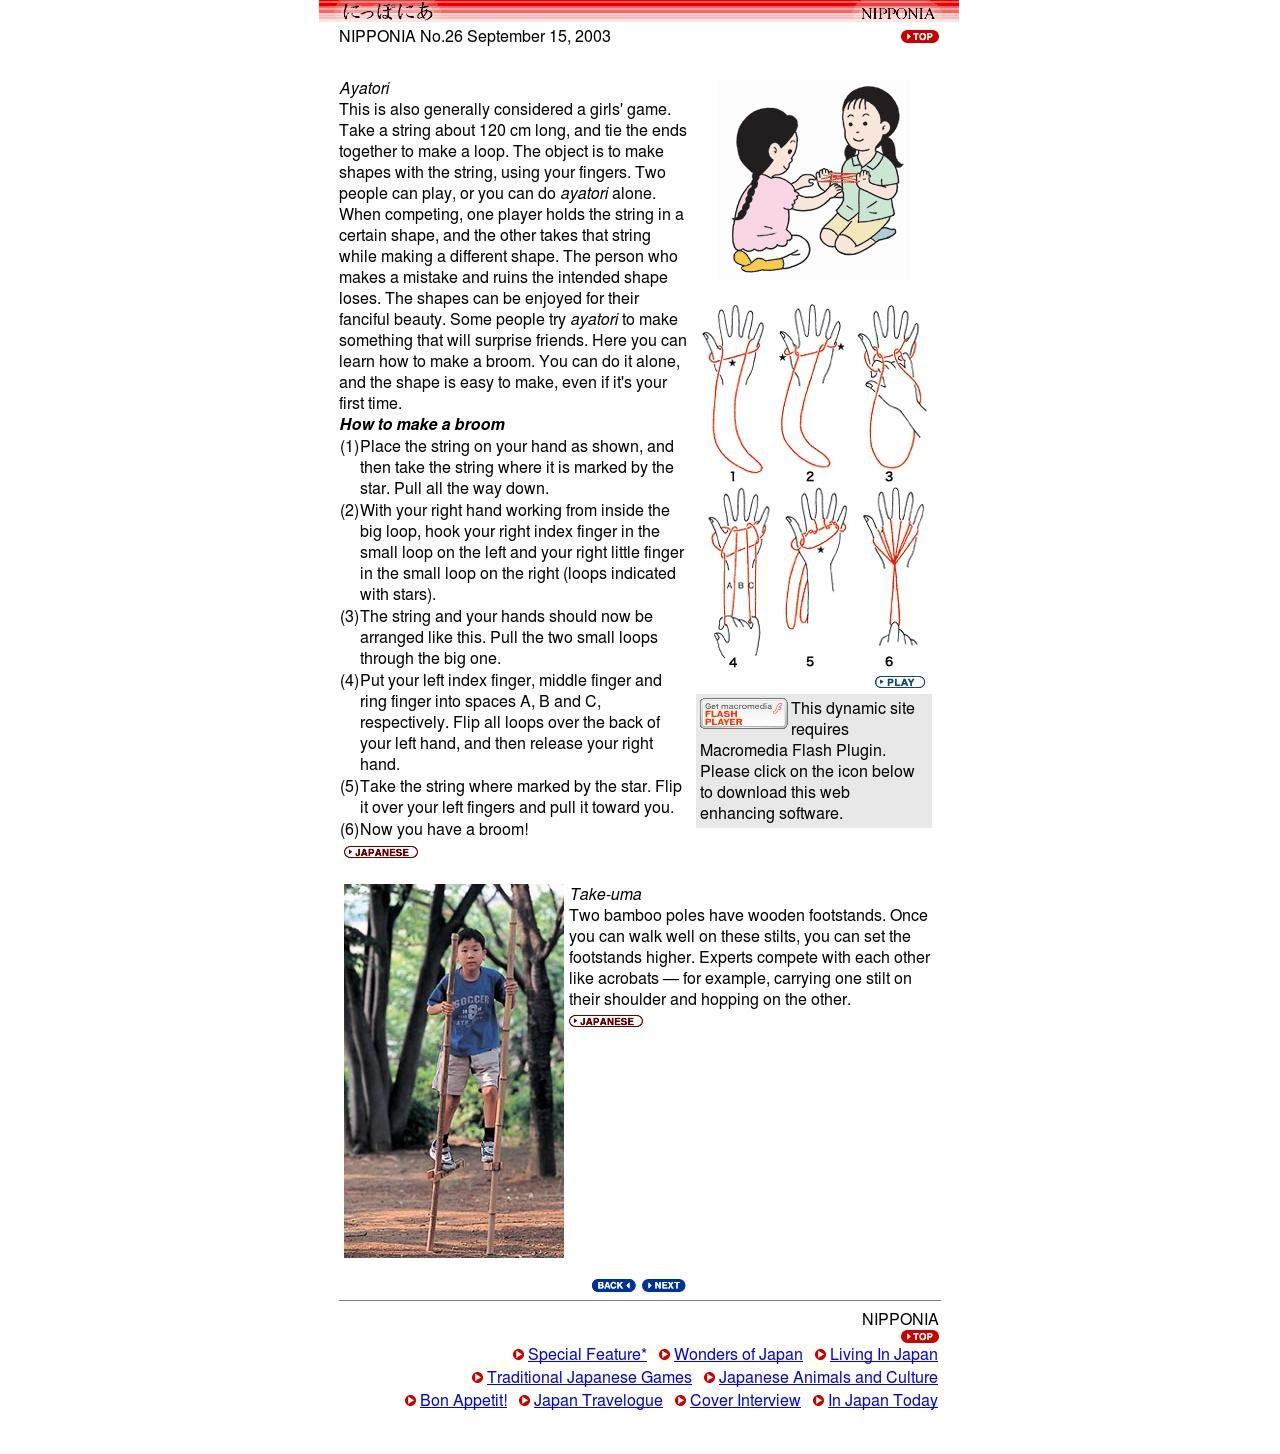 http://web-japan.org/nipponia/nipponia26/en/topic/index02.html